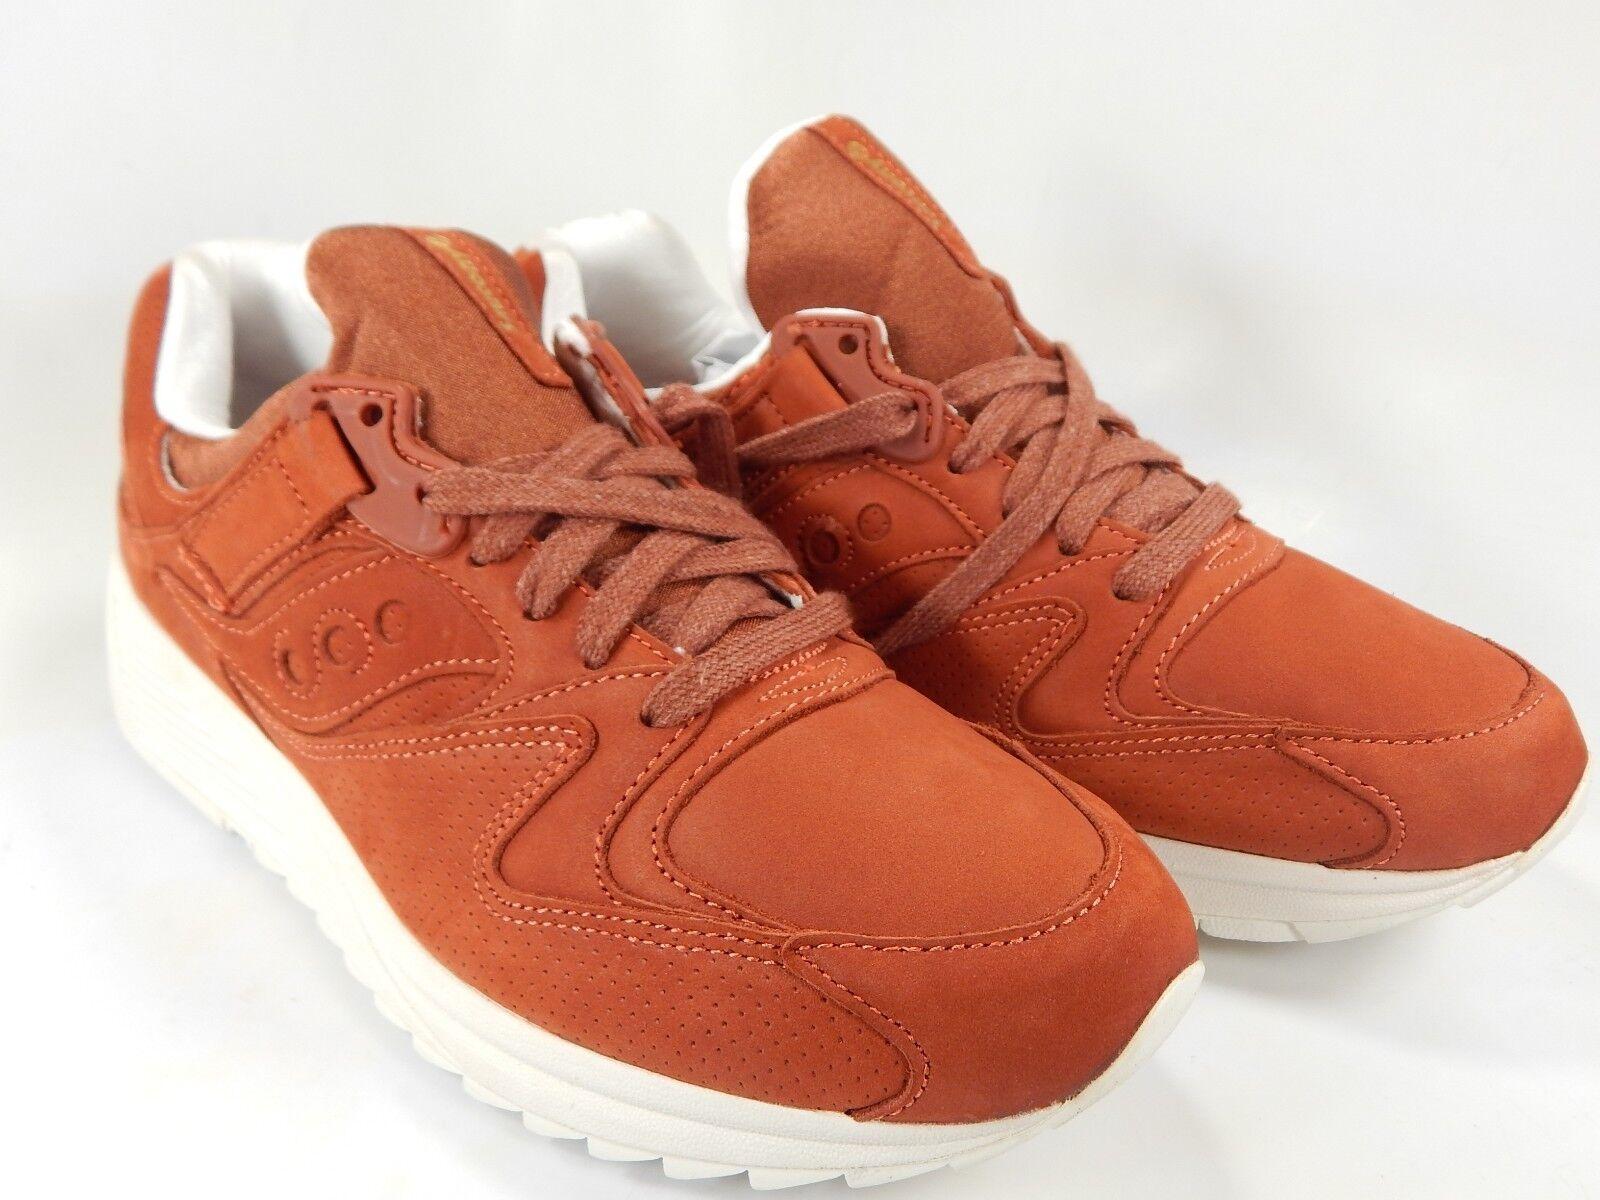 Saucony Grid 8500 HT Original Running Shoes Men's Size 9 M Red S70390-1